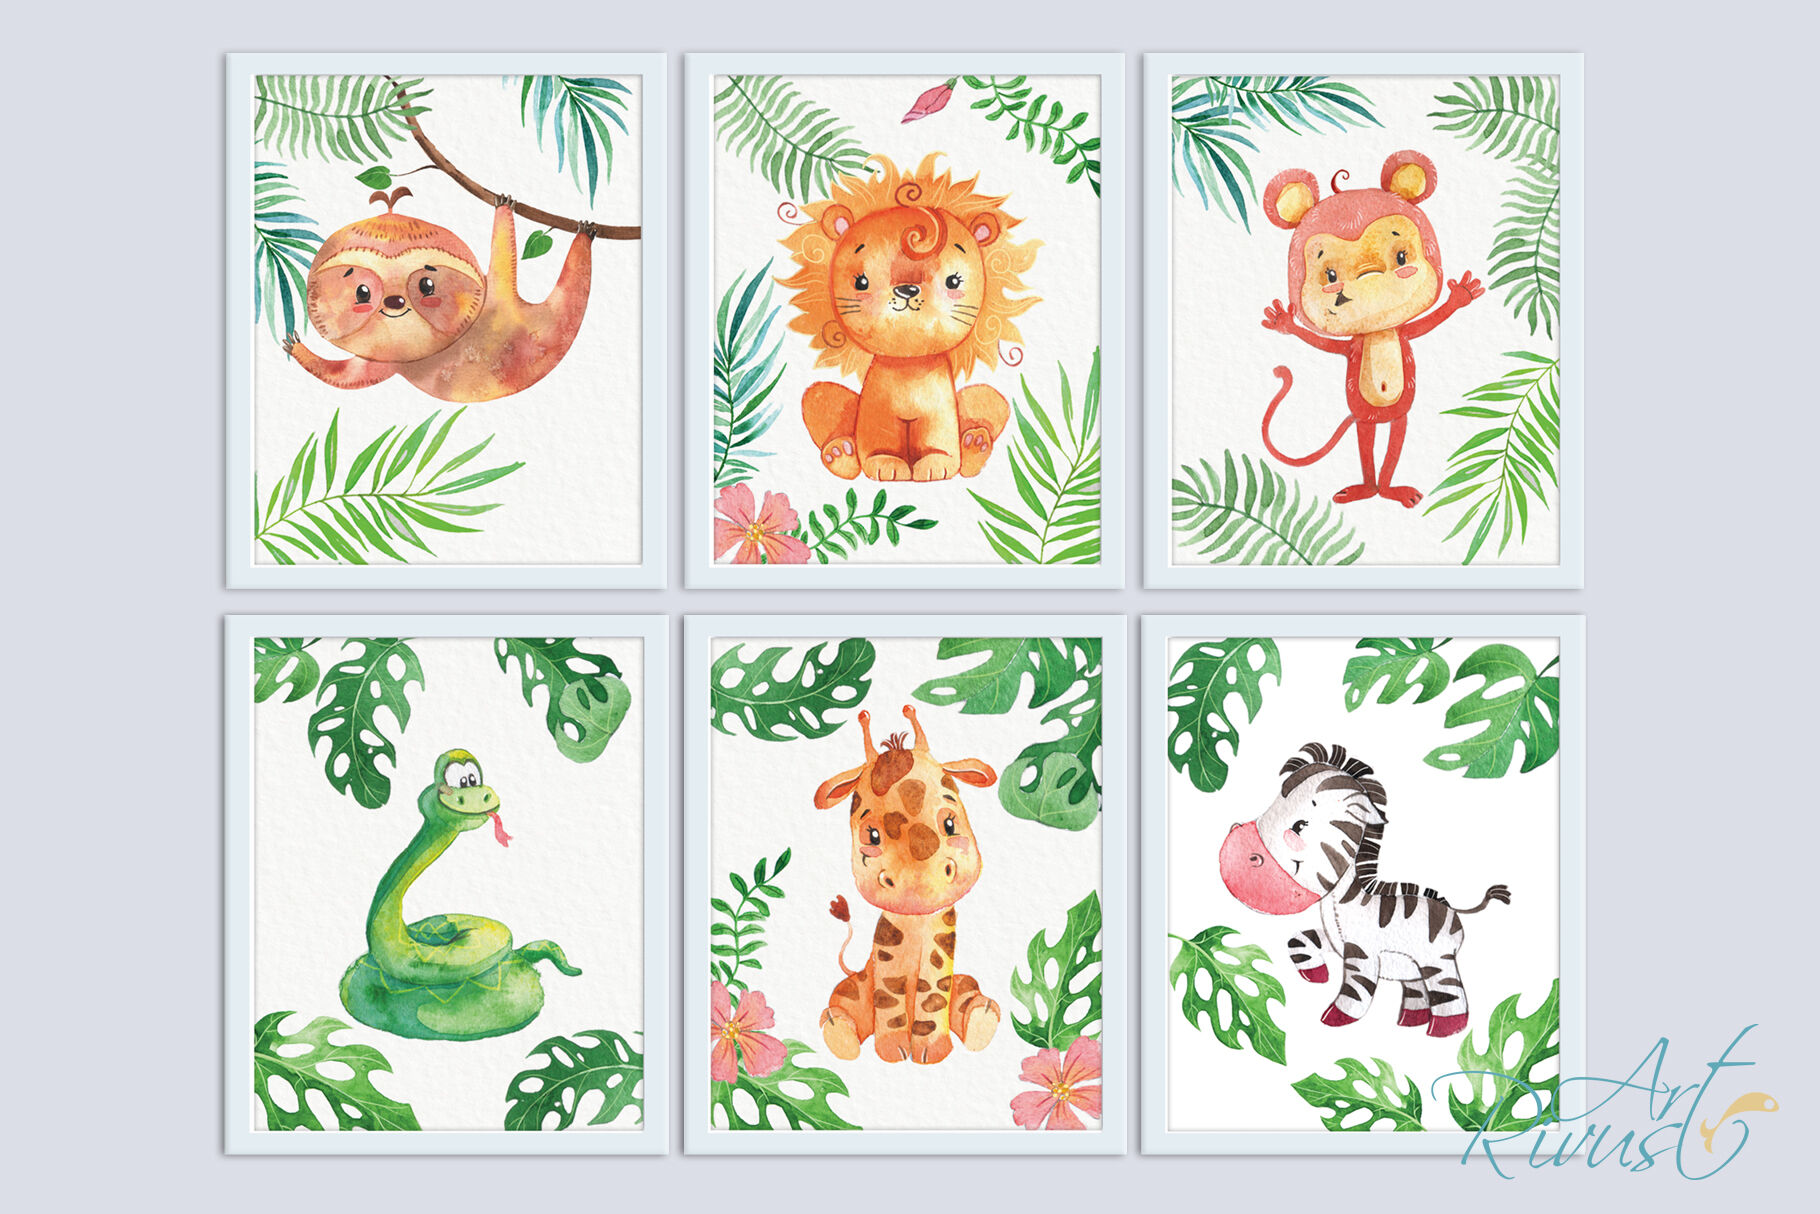 Printable Nursery Art Safari Animals Cute African Wild Animal Wall By Rivus Art Thehungryjpeg Com